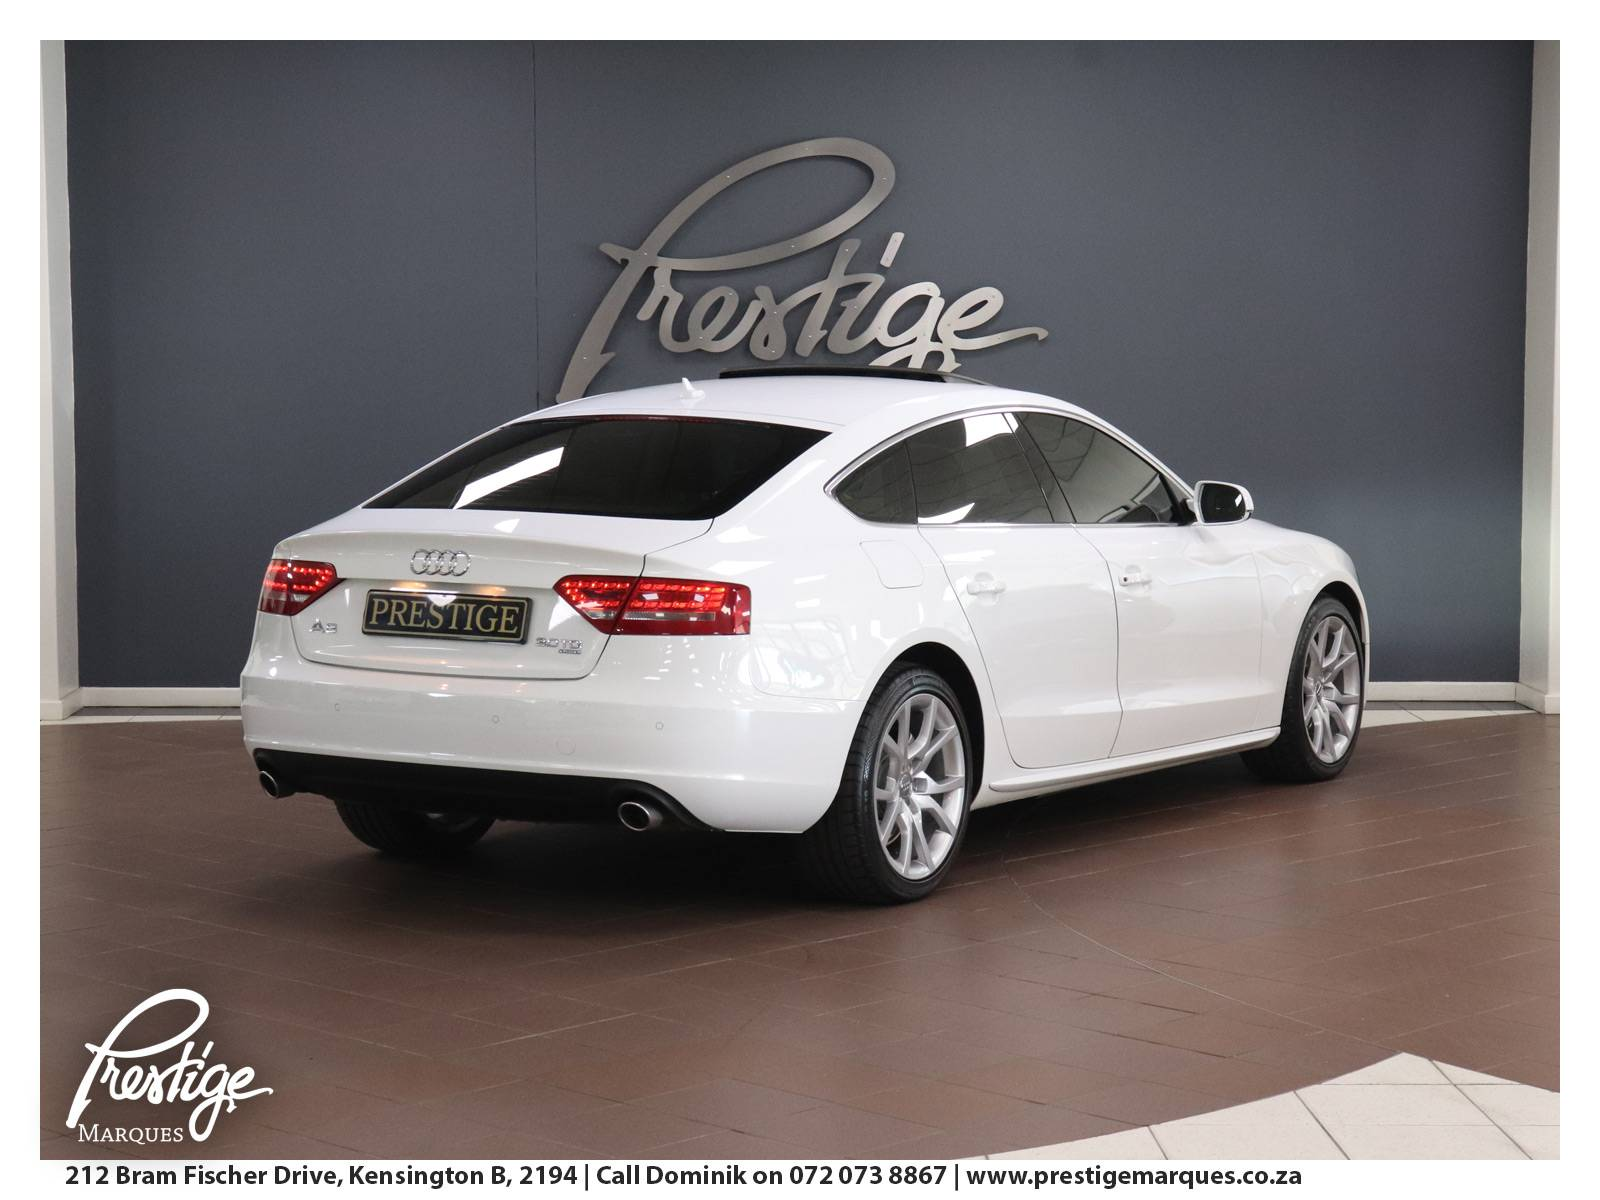 2011-Audi-A5-3.0-TDI-Quattro-Stronic-Prestige-Marques-Randburg-Sandton-3